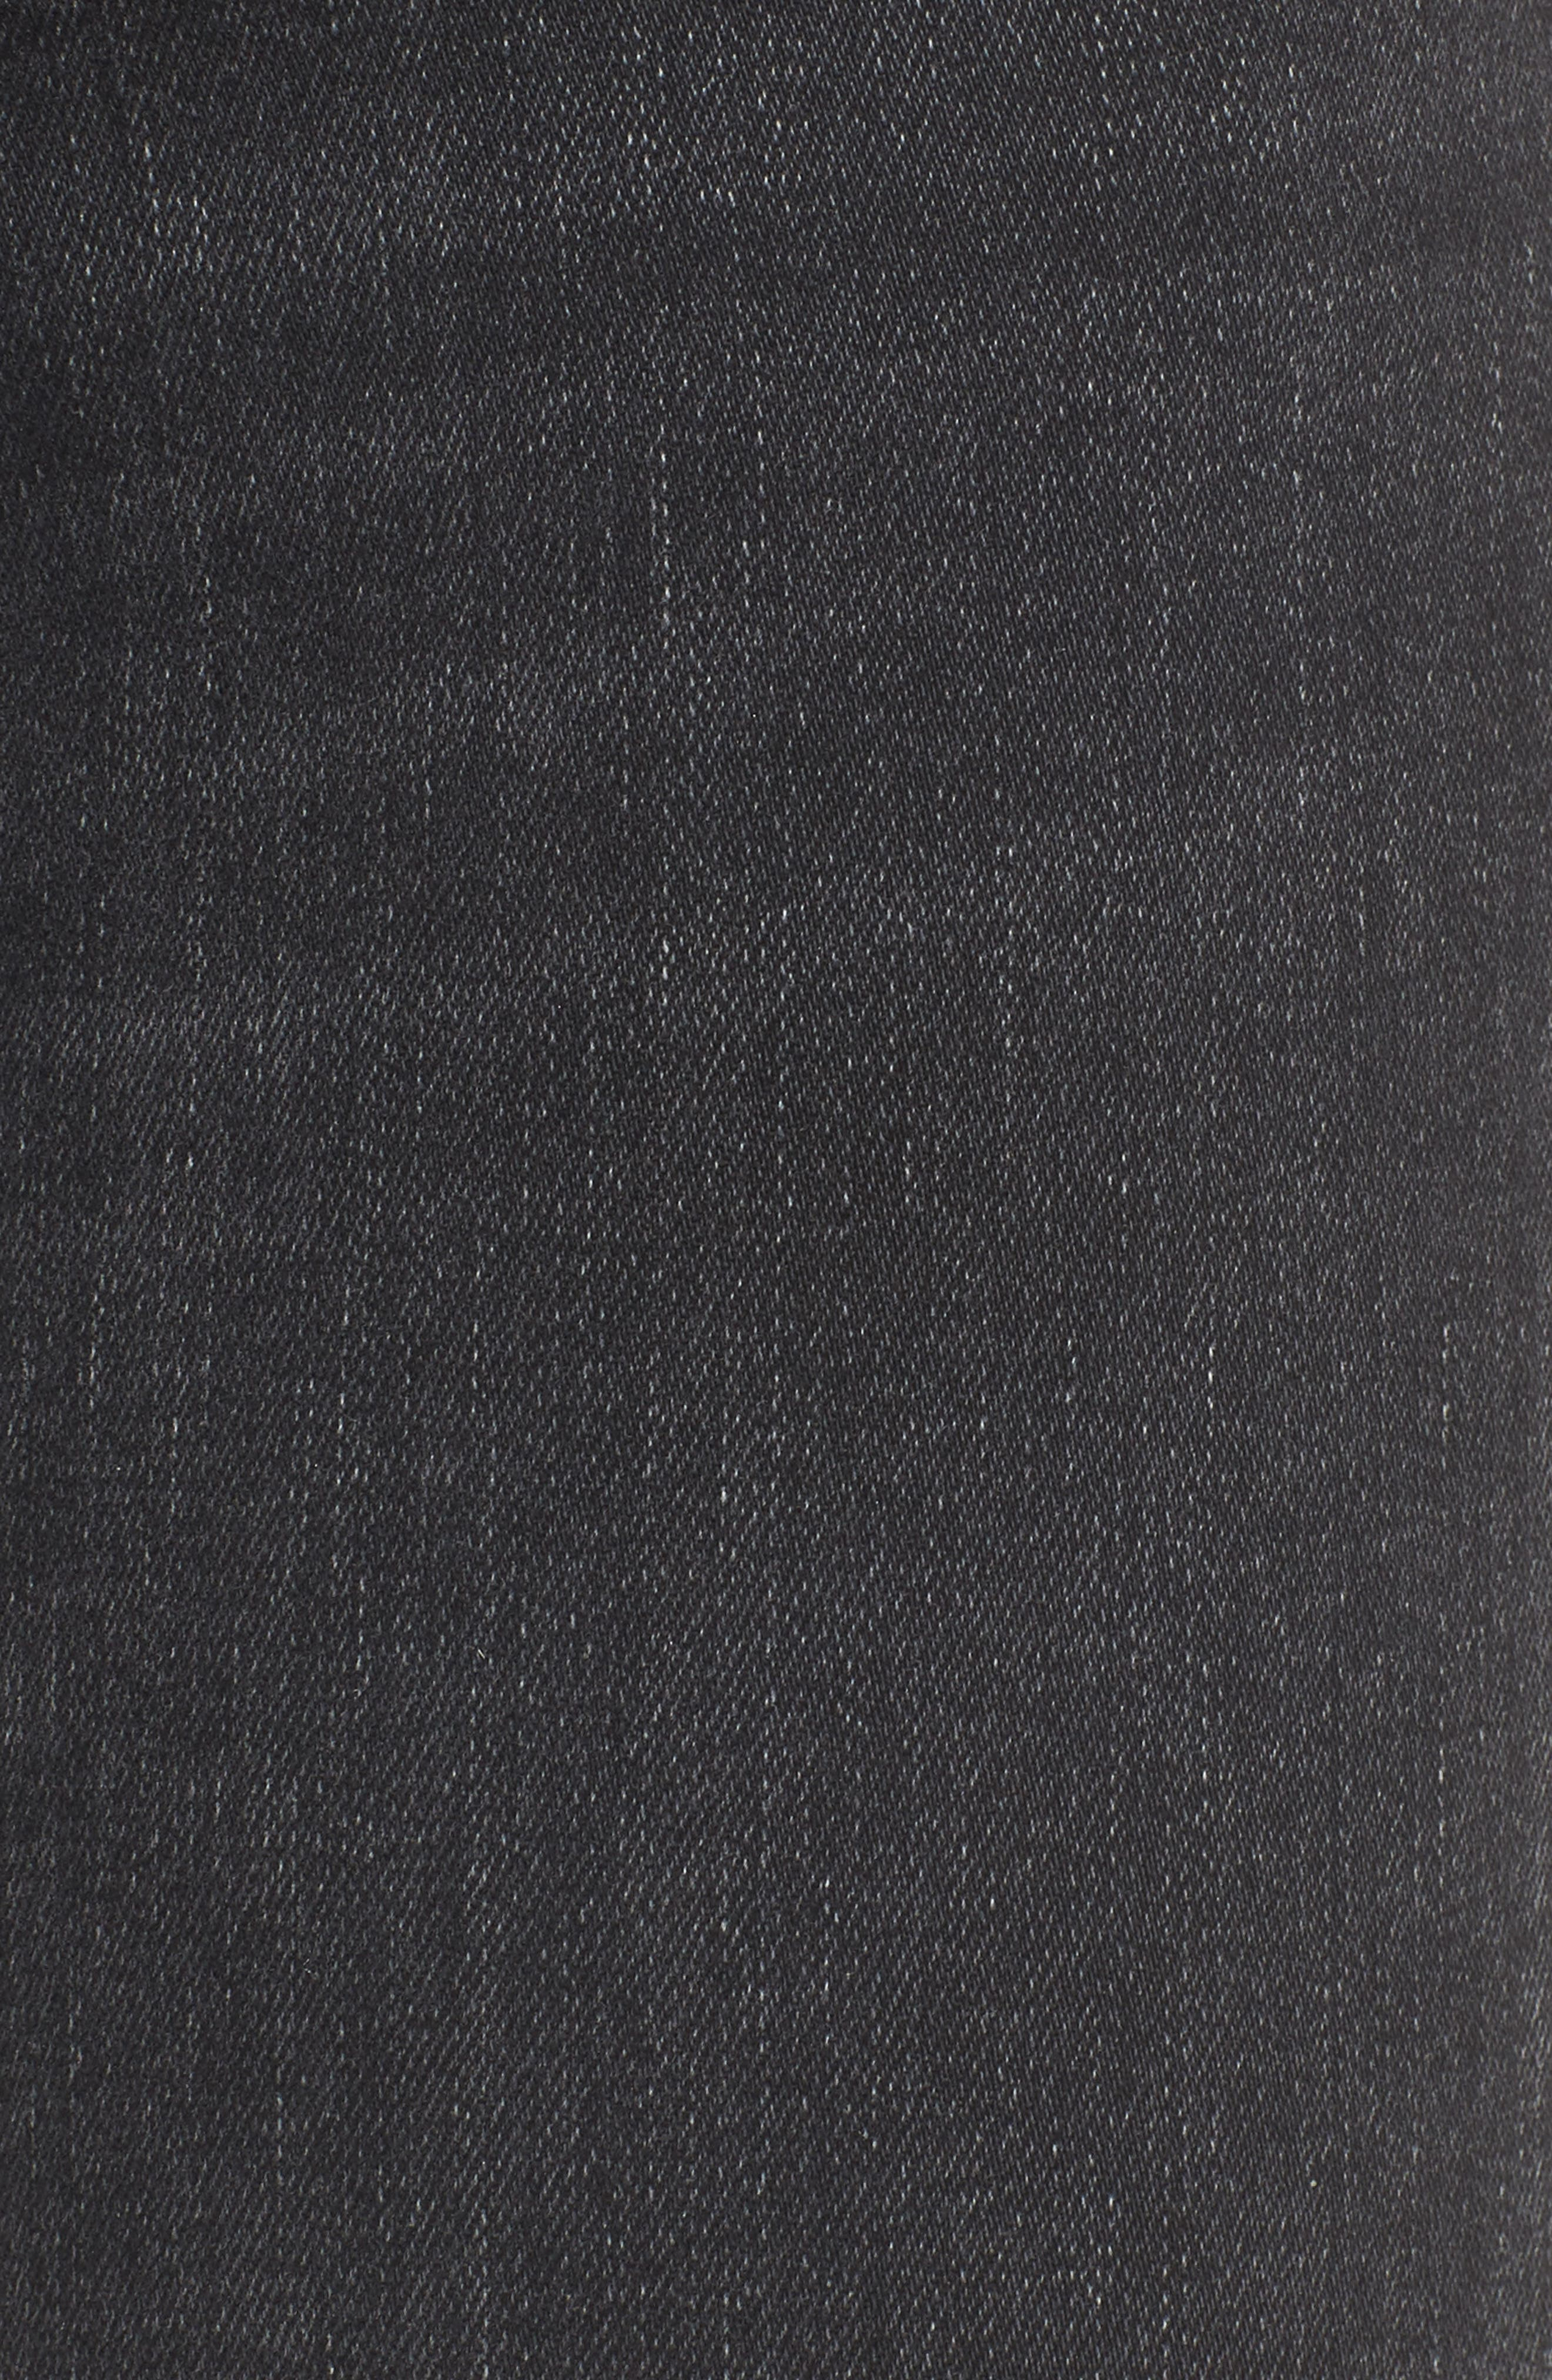 Krista Super Skinny Jeans,                             Alternate thumbnail 5, color,                             8Bit